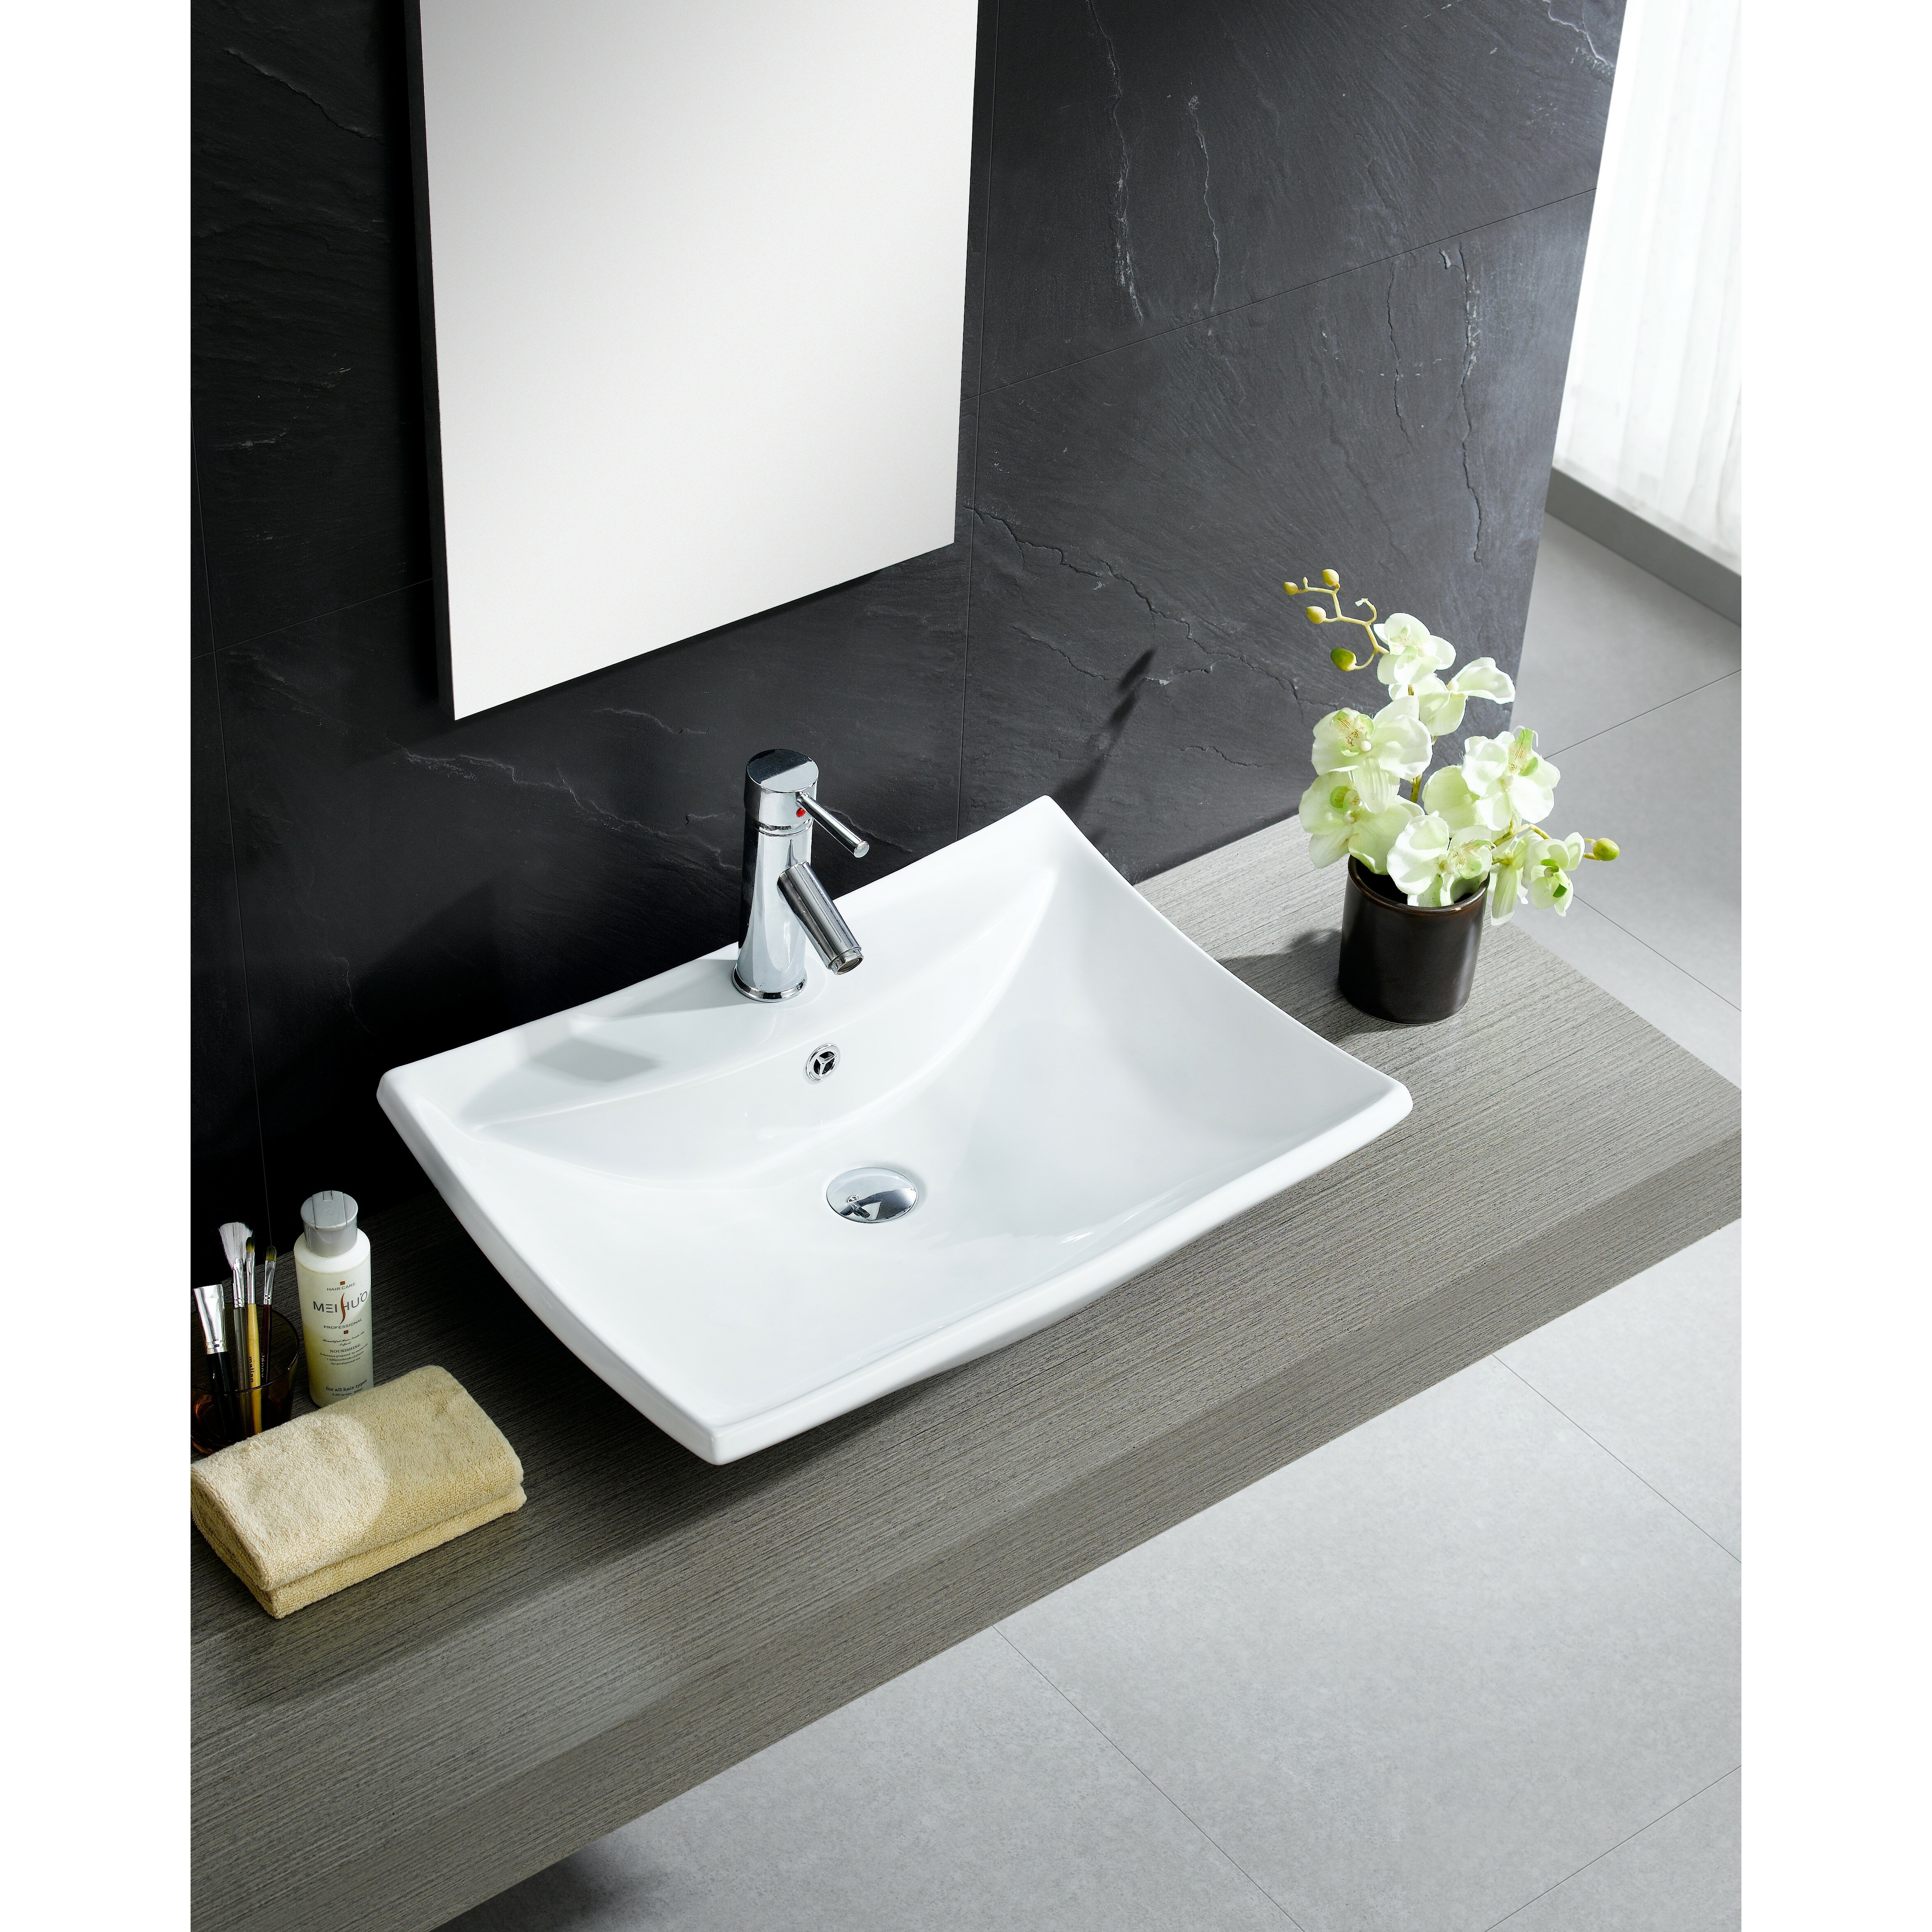 Stylish Bathroom Sinks: Fine Fixtures Modern Vitreous Square Vessel Sink Vessel